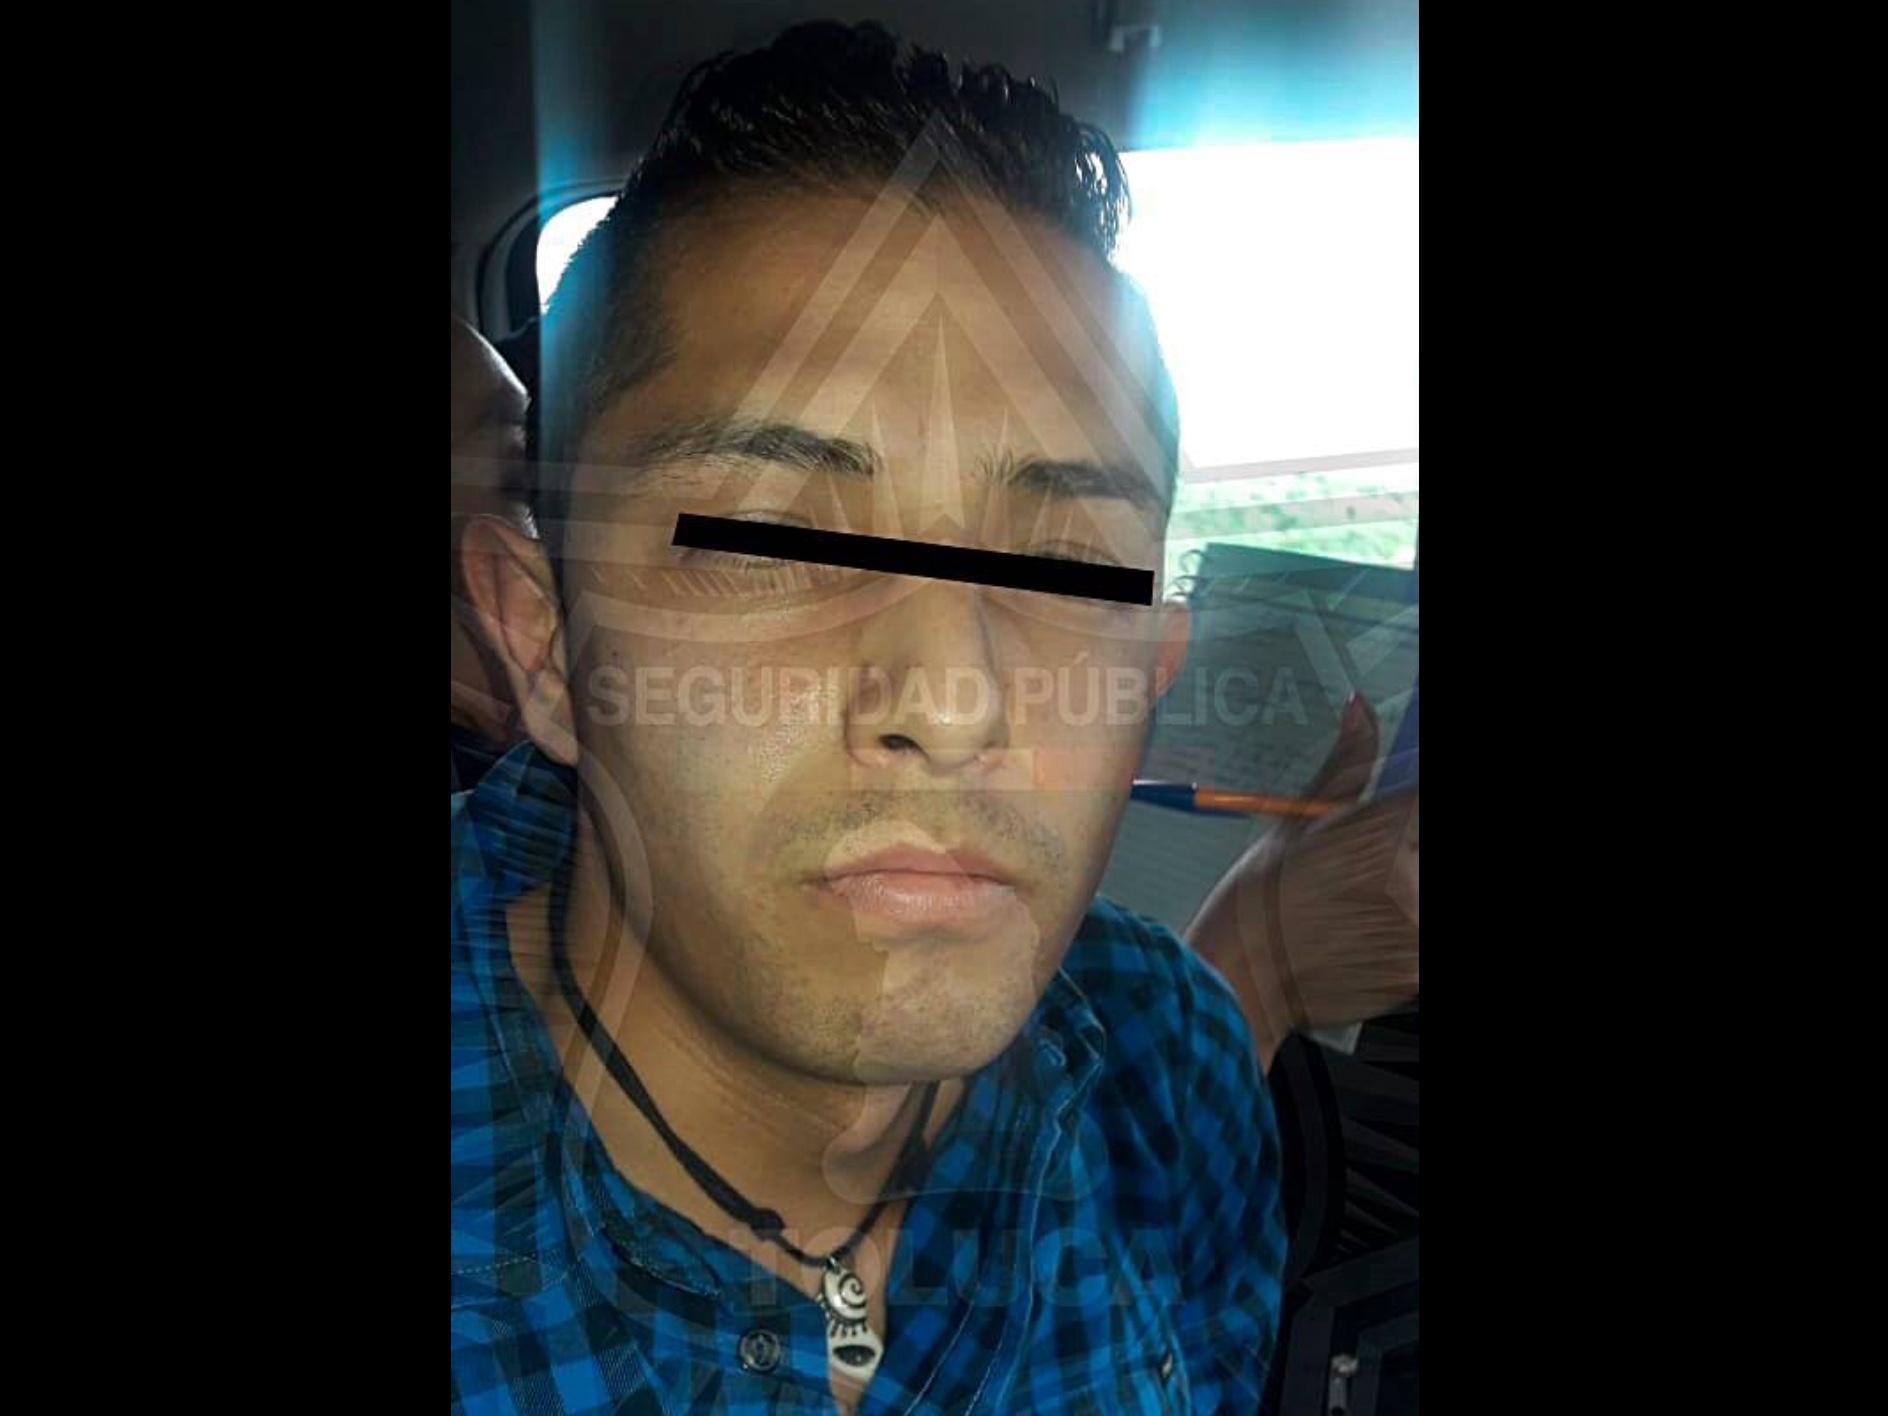 Cae asesino de Alejandro en Toluca